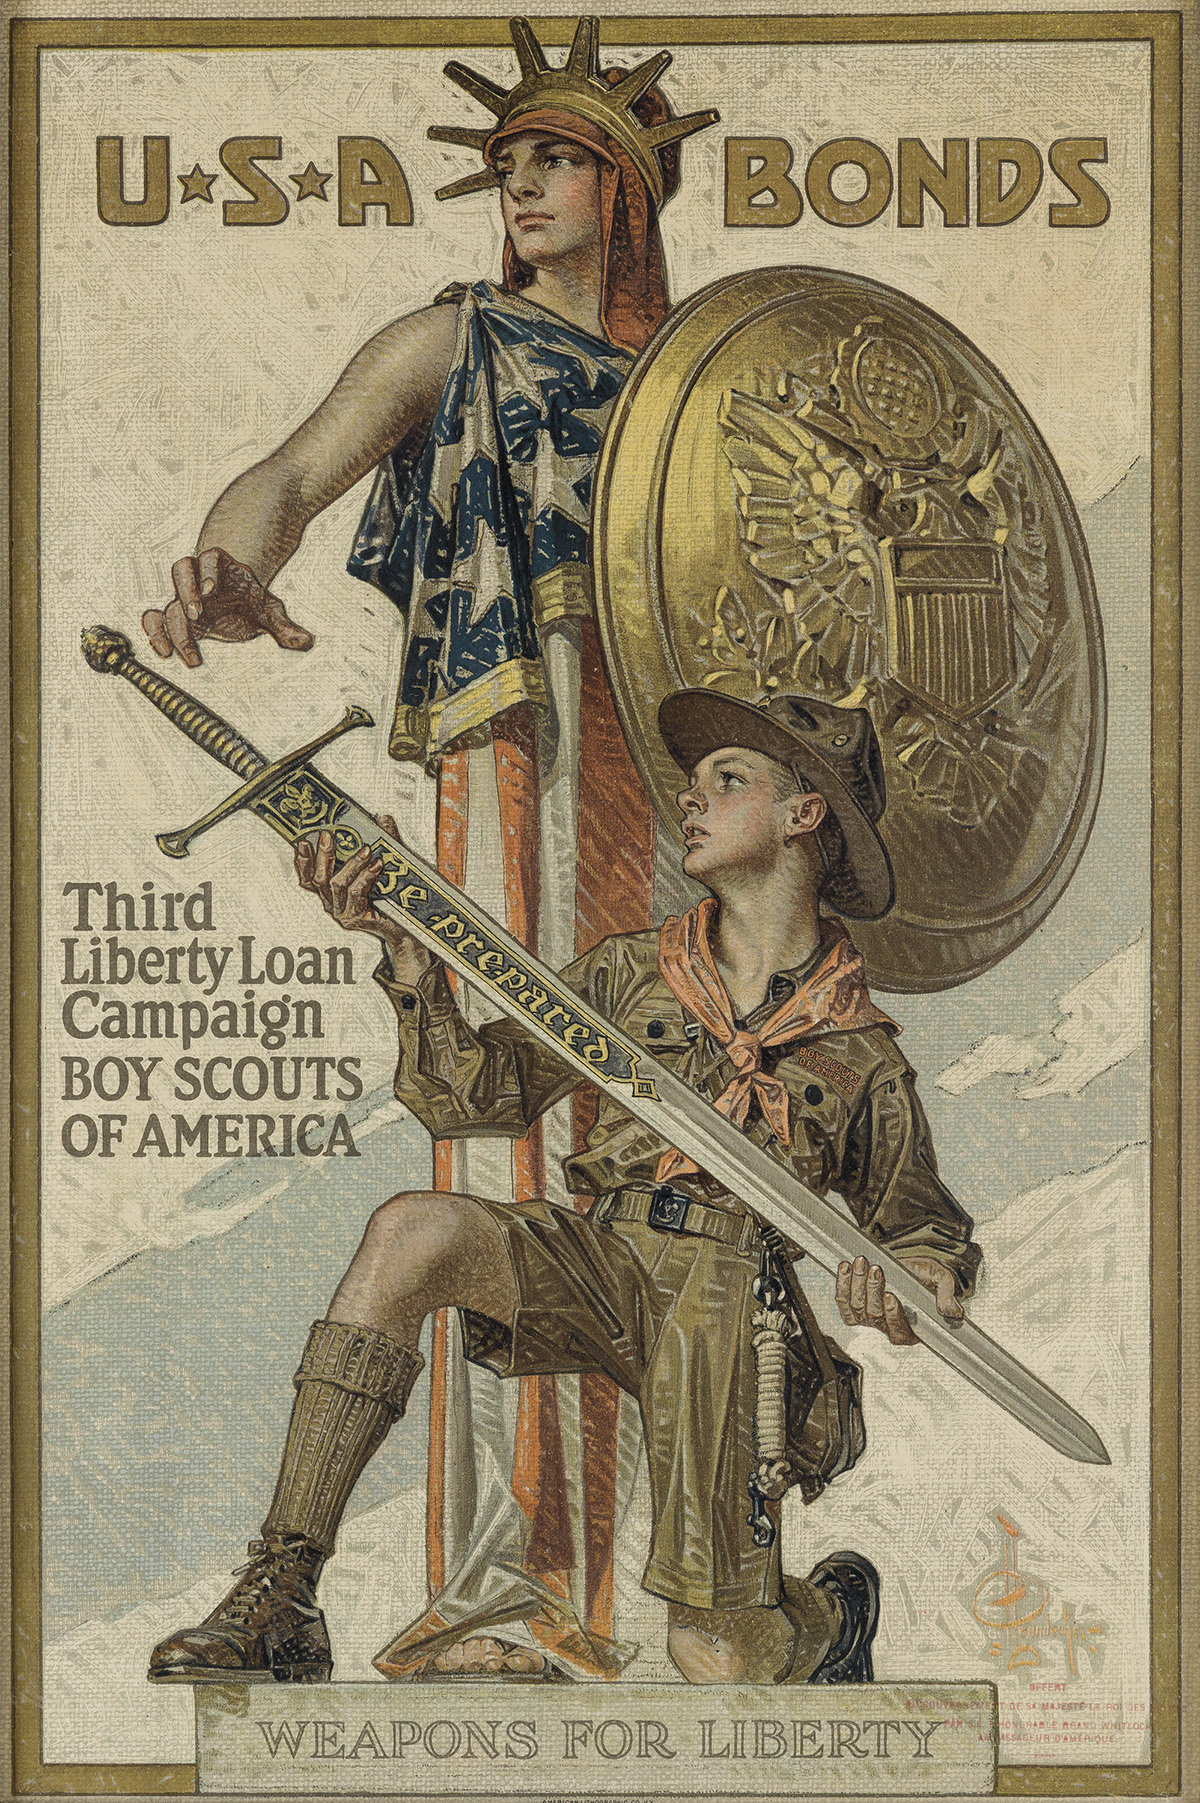 JOSEPH-C-LEYENDECKER-(1874-1951)-USA-BONDS--THIRD-LIBERTY-LO